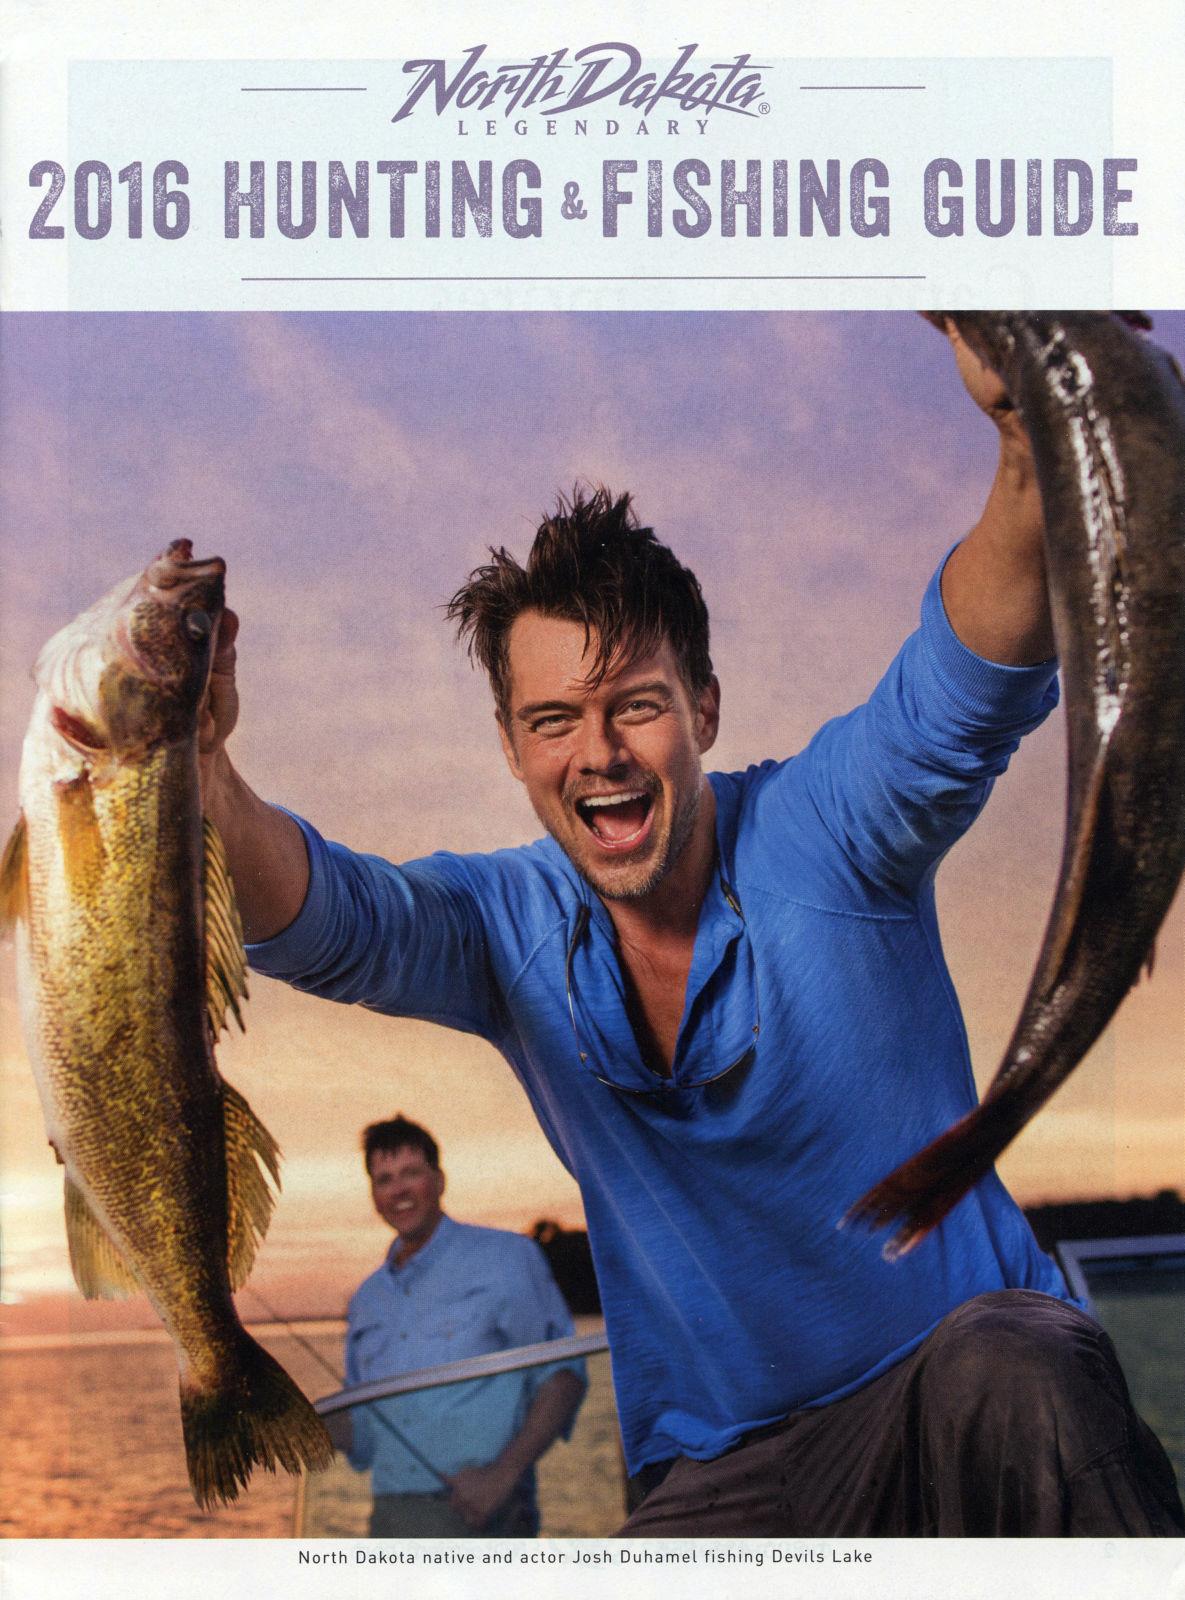 Hunting & Fishing Guide